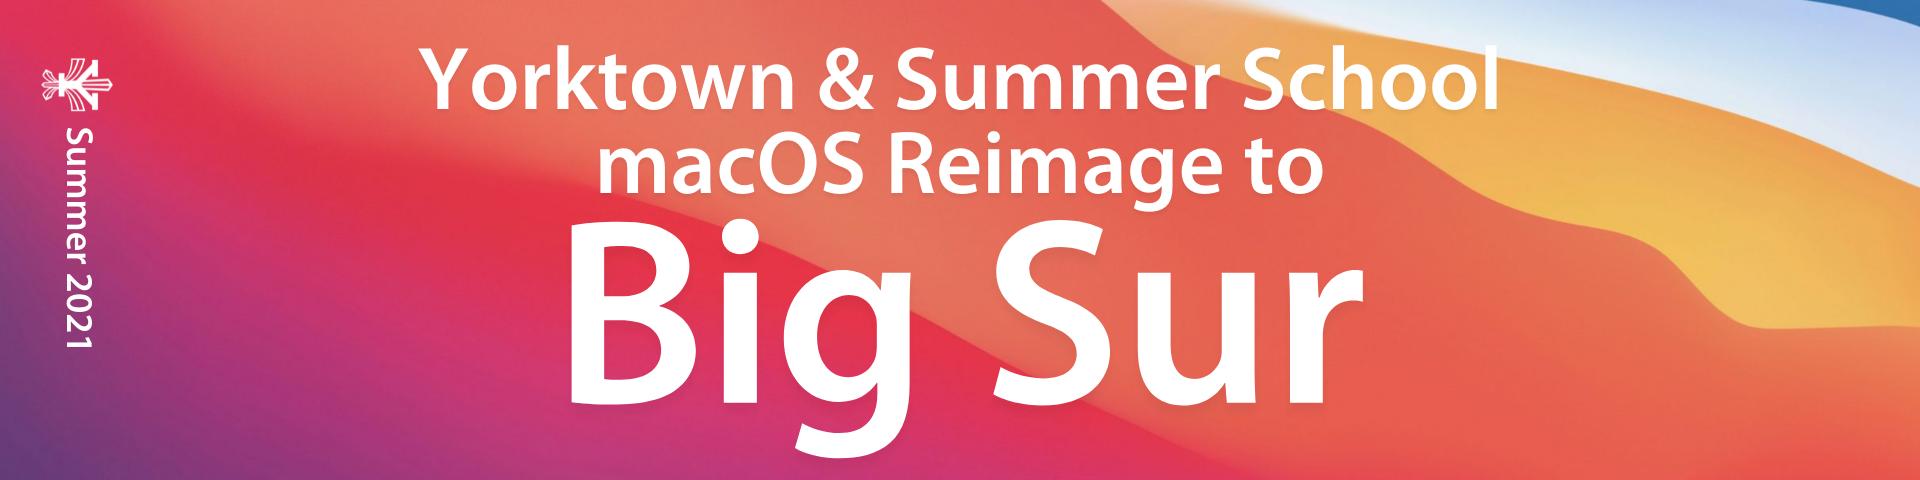 Yorktown & Summer School MacOS Reimage to Big Sur - Summer 2021